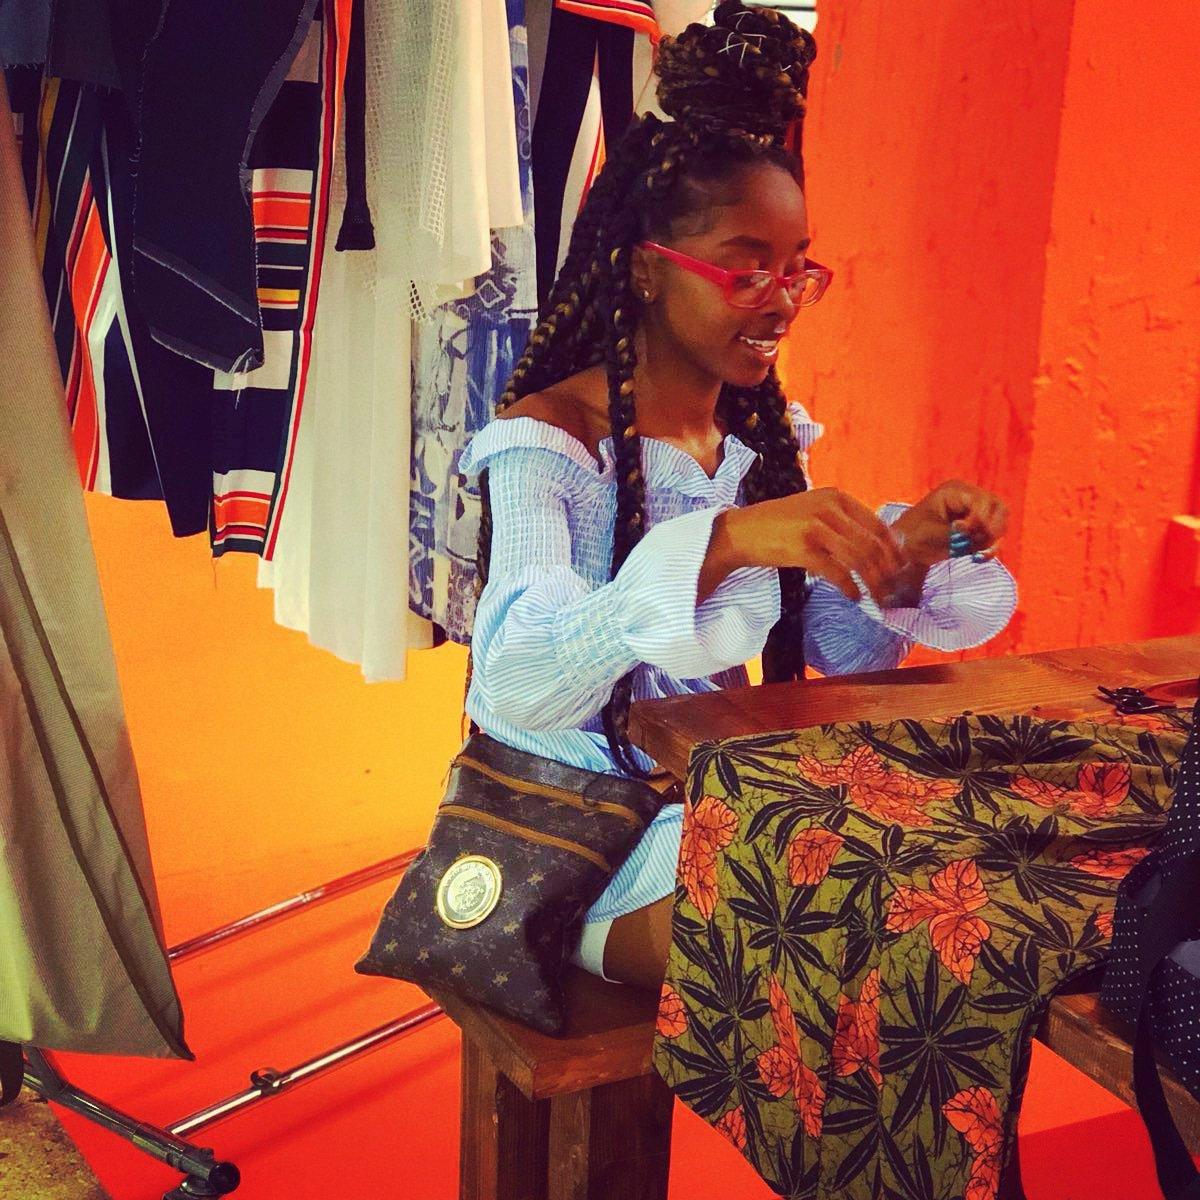 Hello Fashion World Designer ShamareeSherese is here to cater to you...  #multitaltented #fashion #fashionproduction #designer #coordinator #fashionlife #flintalleyfest #fashionhub #atltoflint #movingmountains #livingmydesignerlife #ShamareeShereseBestLife pic.twitter.com/Kj2jT6U3KB